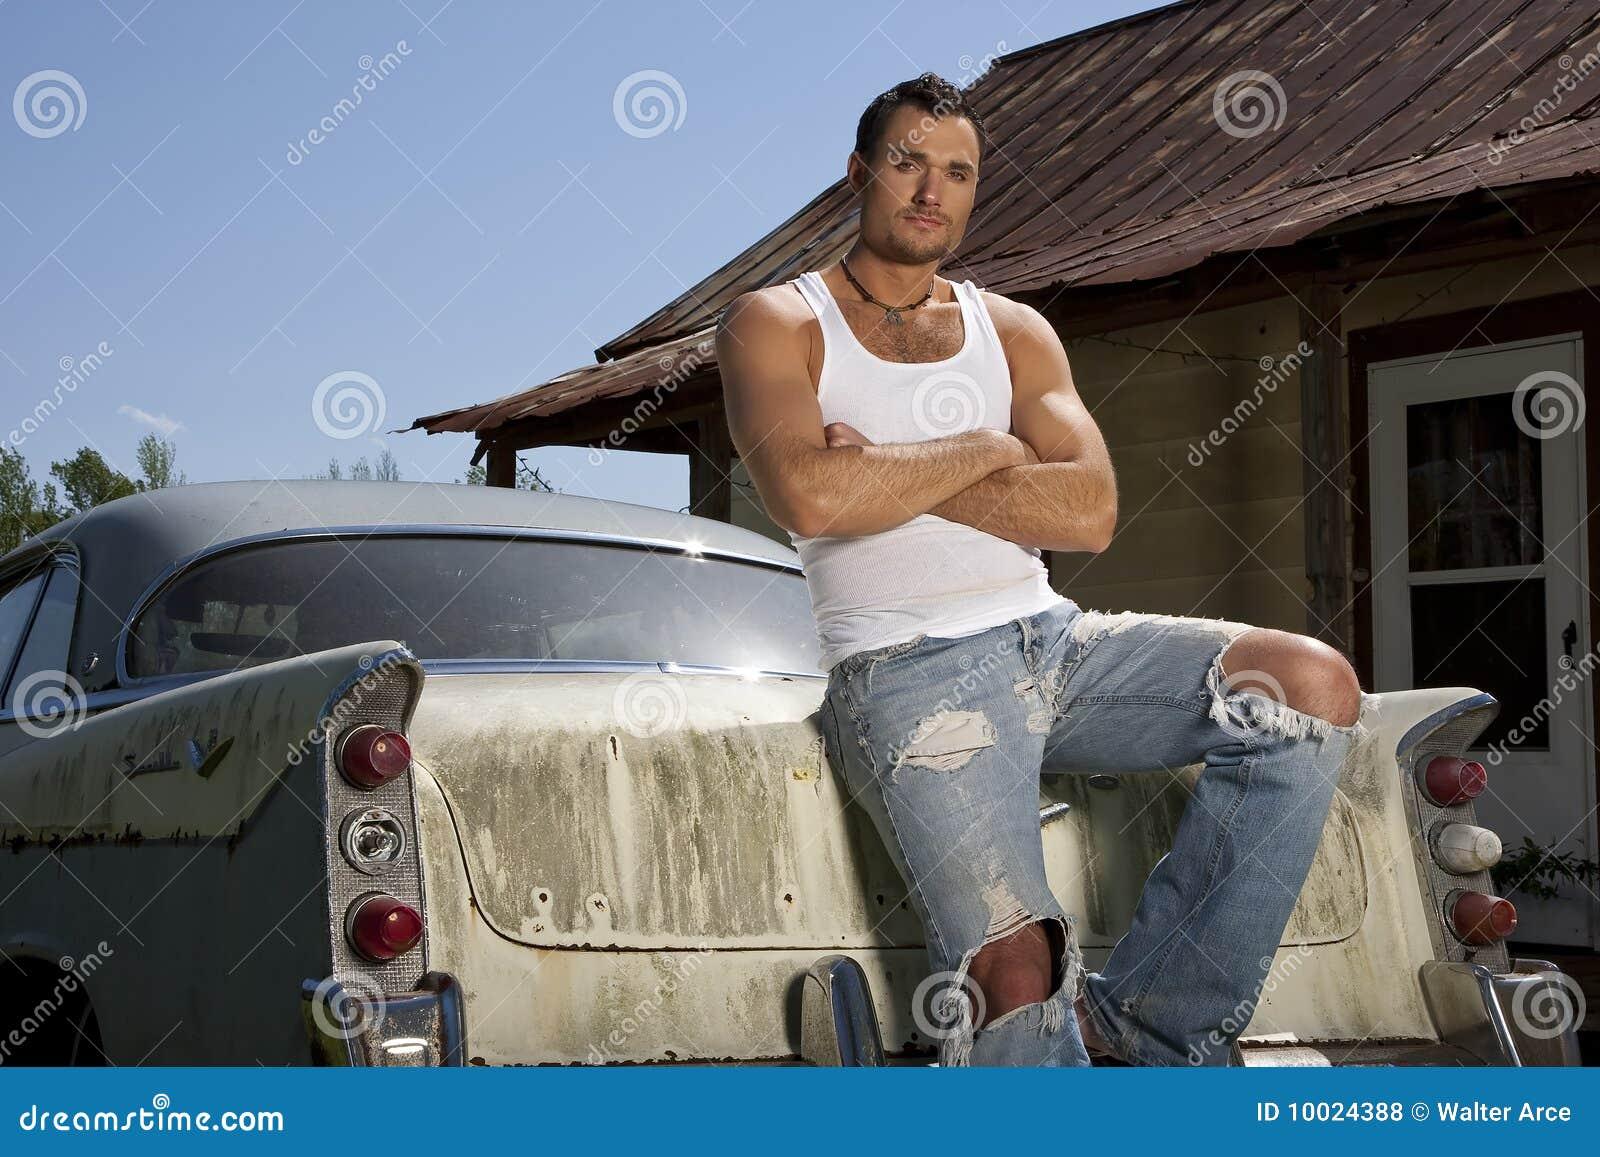 Model boys europromodel apollo pictures to pin on pinterest richie boy 0066 voltagebd Images